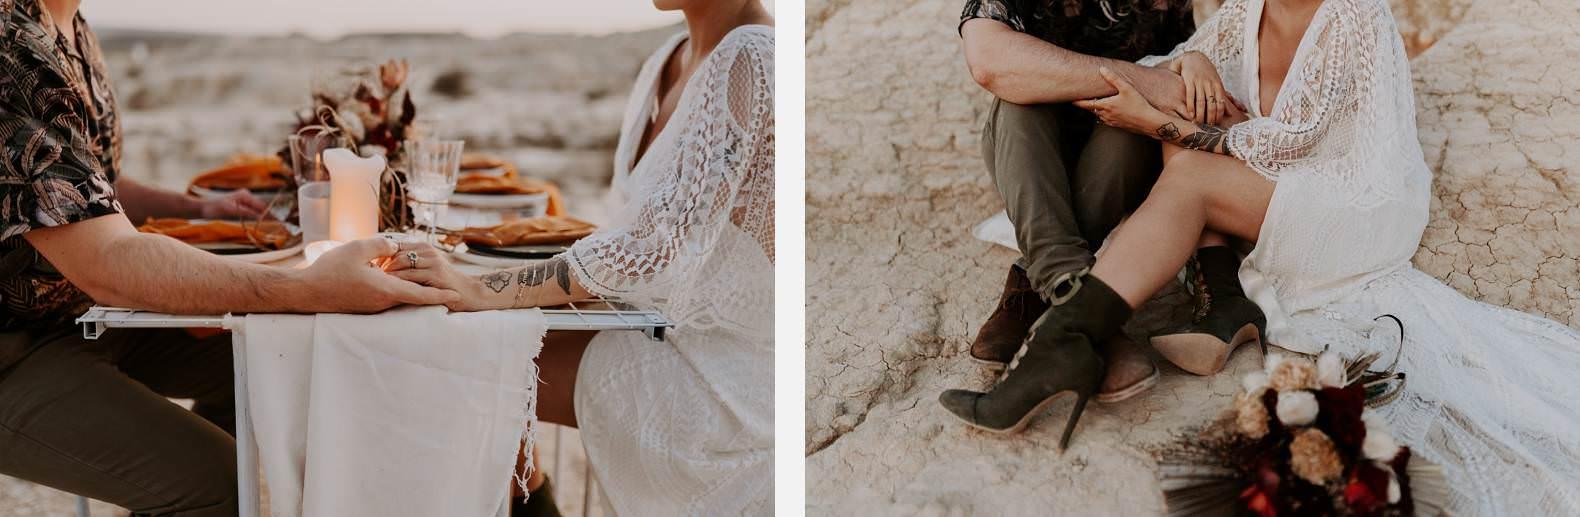 mariage espagne bardenas festival you and me elopement photographe bel esprit desert 0059